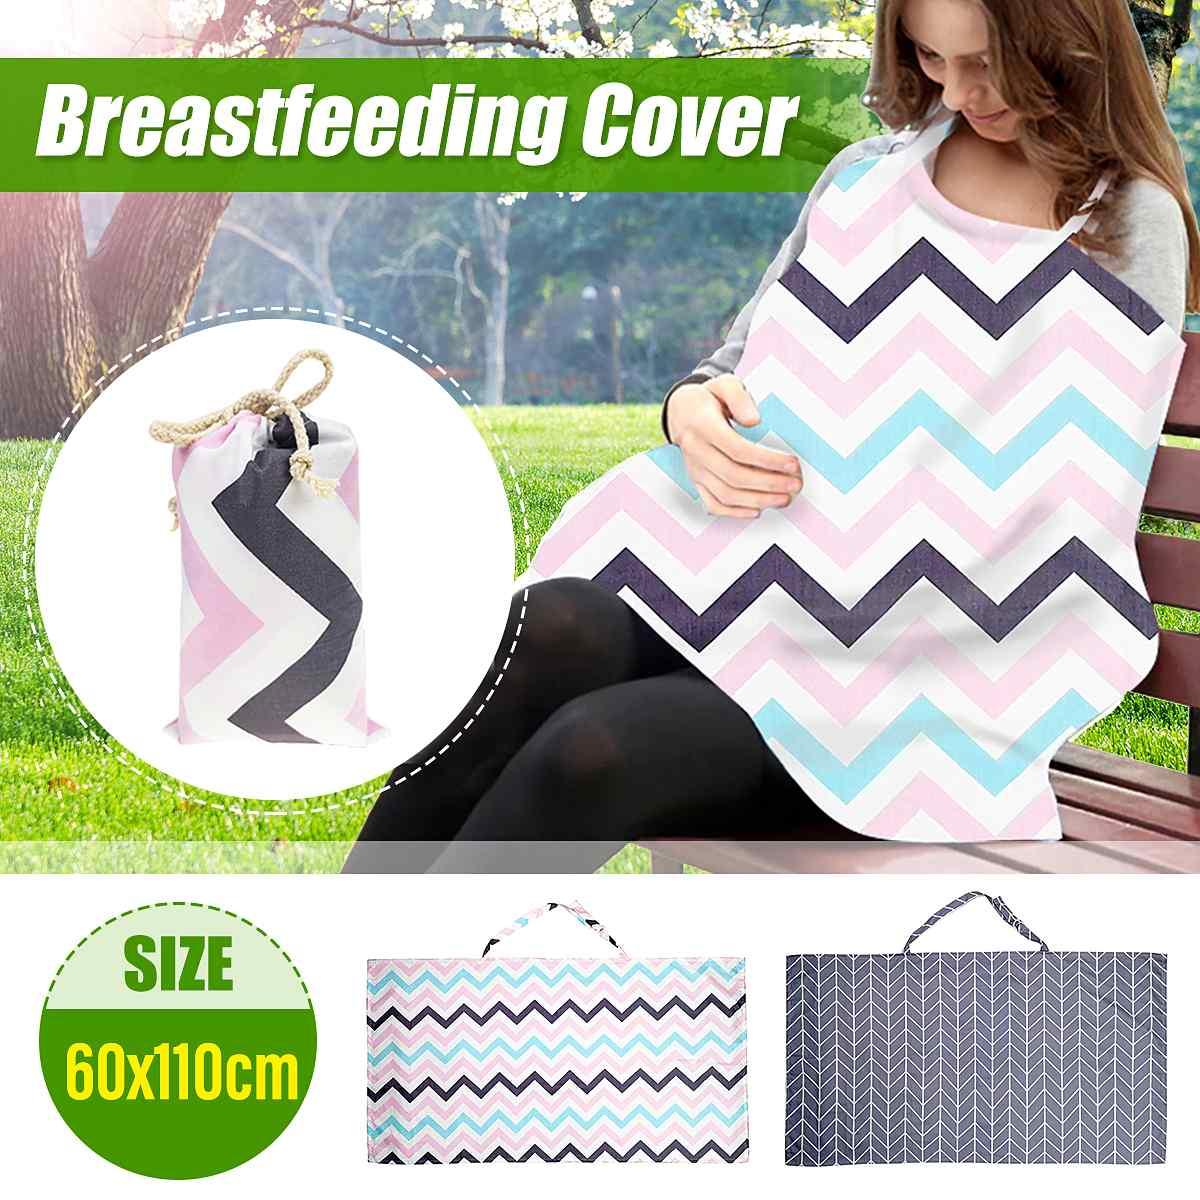 Mother Nursing Cover Outing Breastfeeding Towel Cotton Baby Feeding Anti-glare Nursing Cloth Apron 60x110cm + Storage Bag